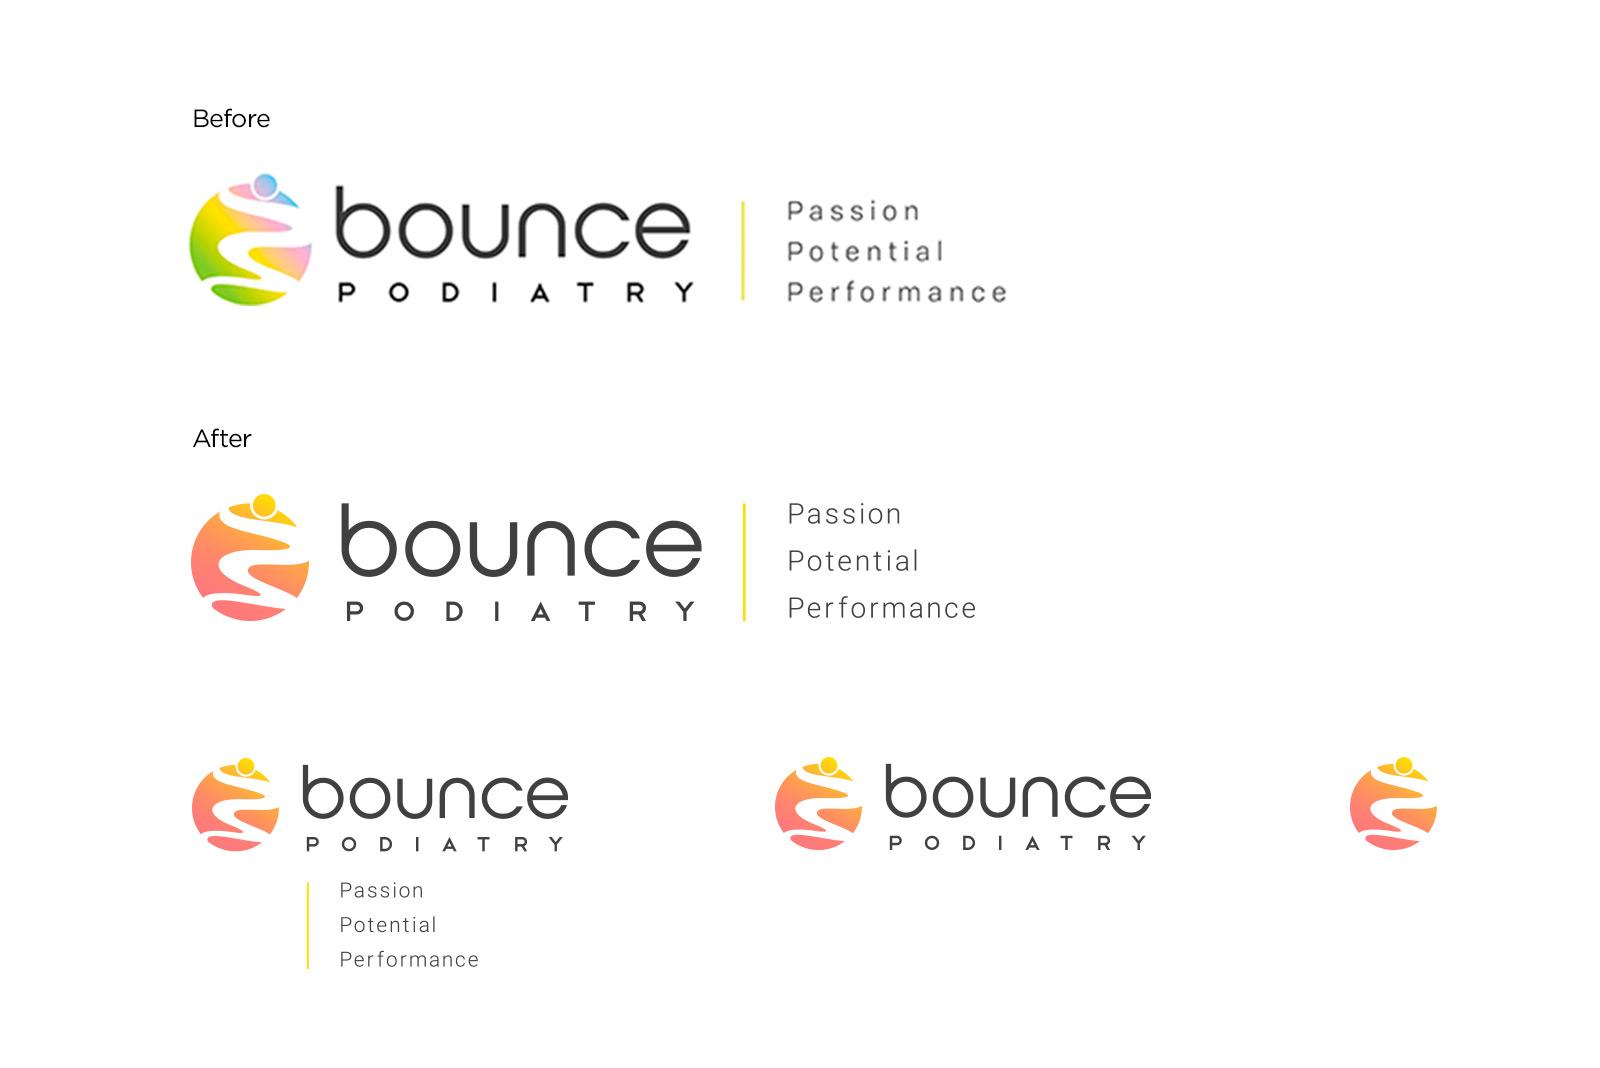 bounce-podiatry_logo_geena-mcinnes.jpg